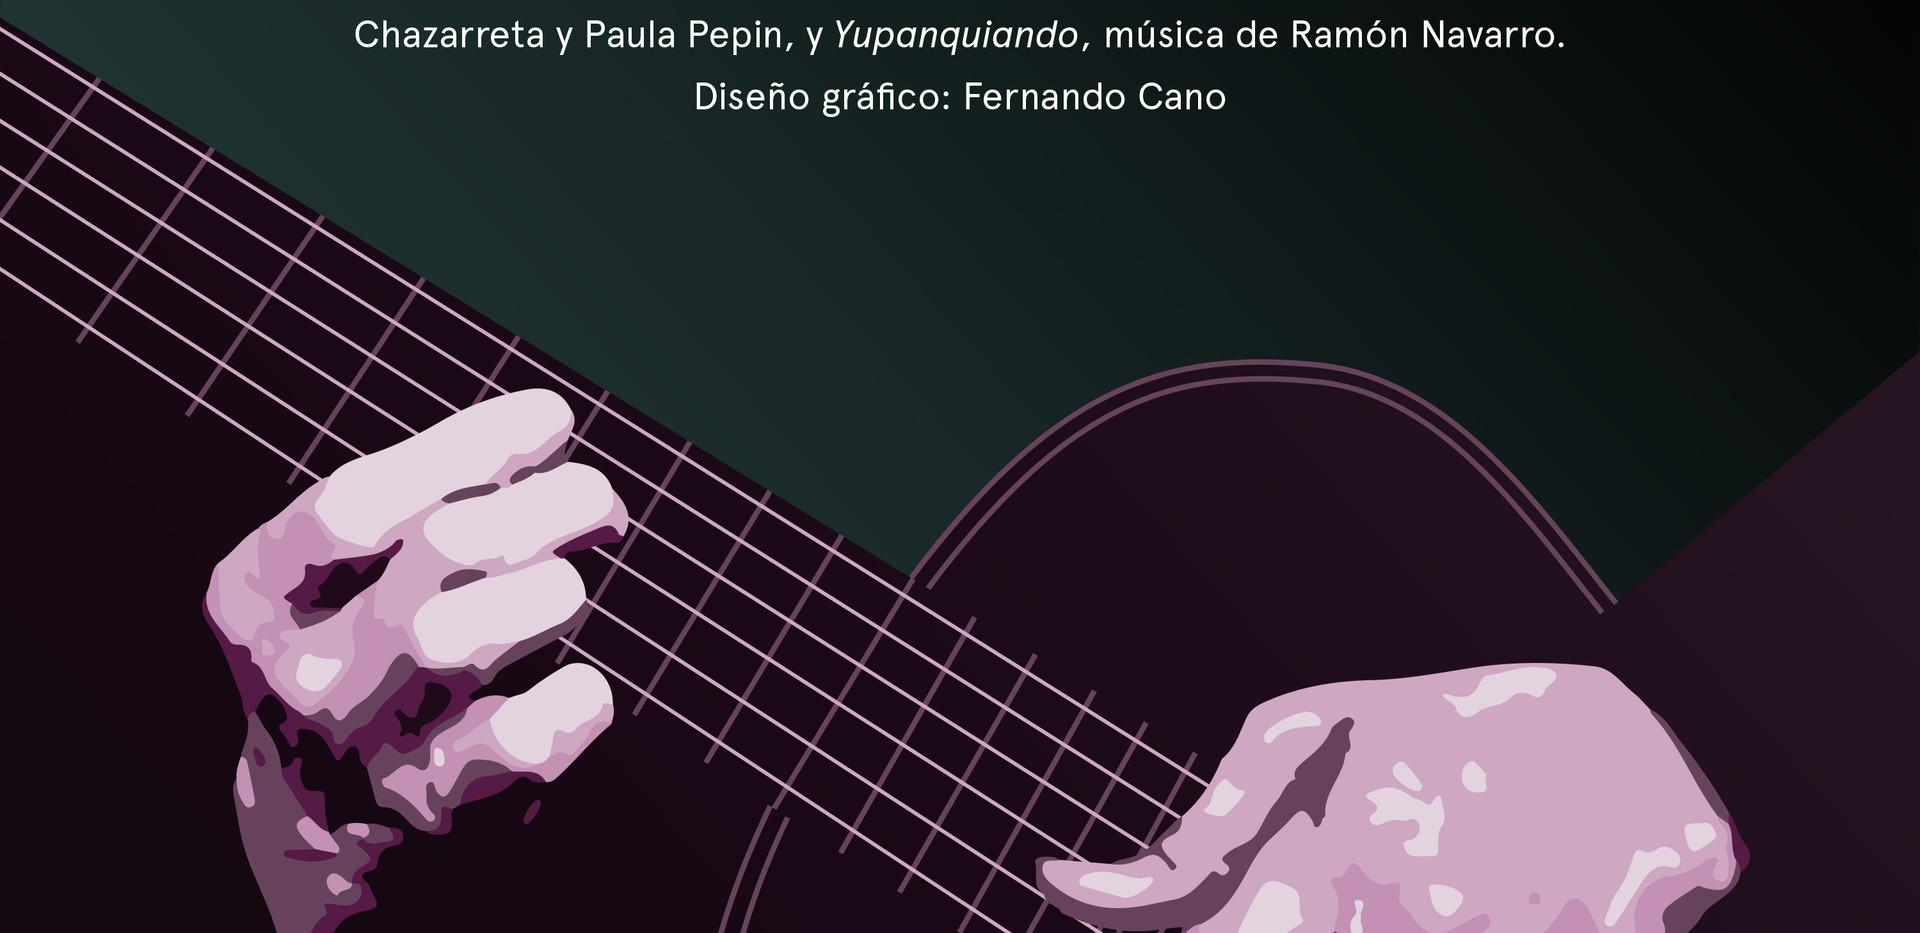 INLAY_YUPANQUIANDO.jpg